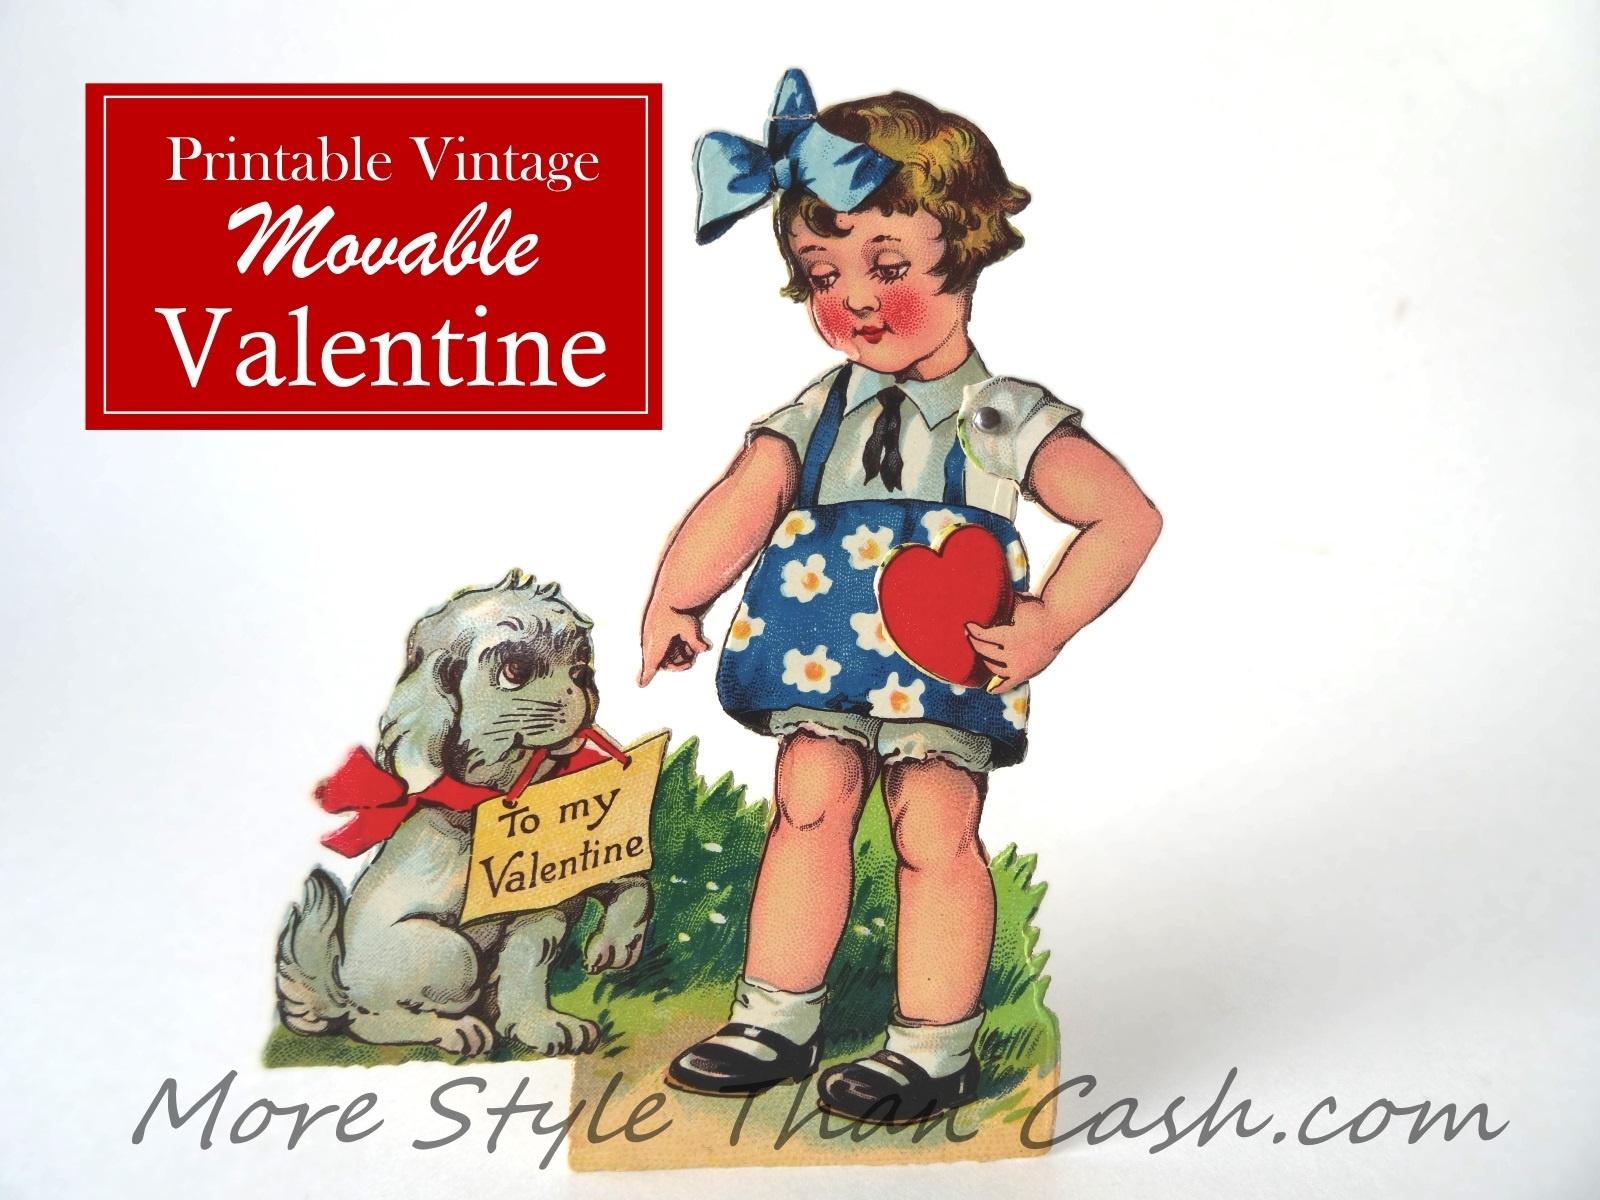 Vintage Movable Valentine Printable - Free Printable Vintage Valentine Pictures